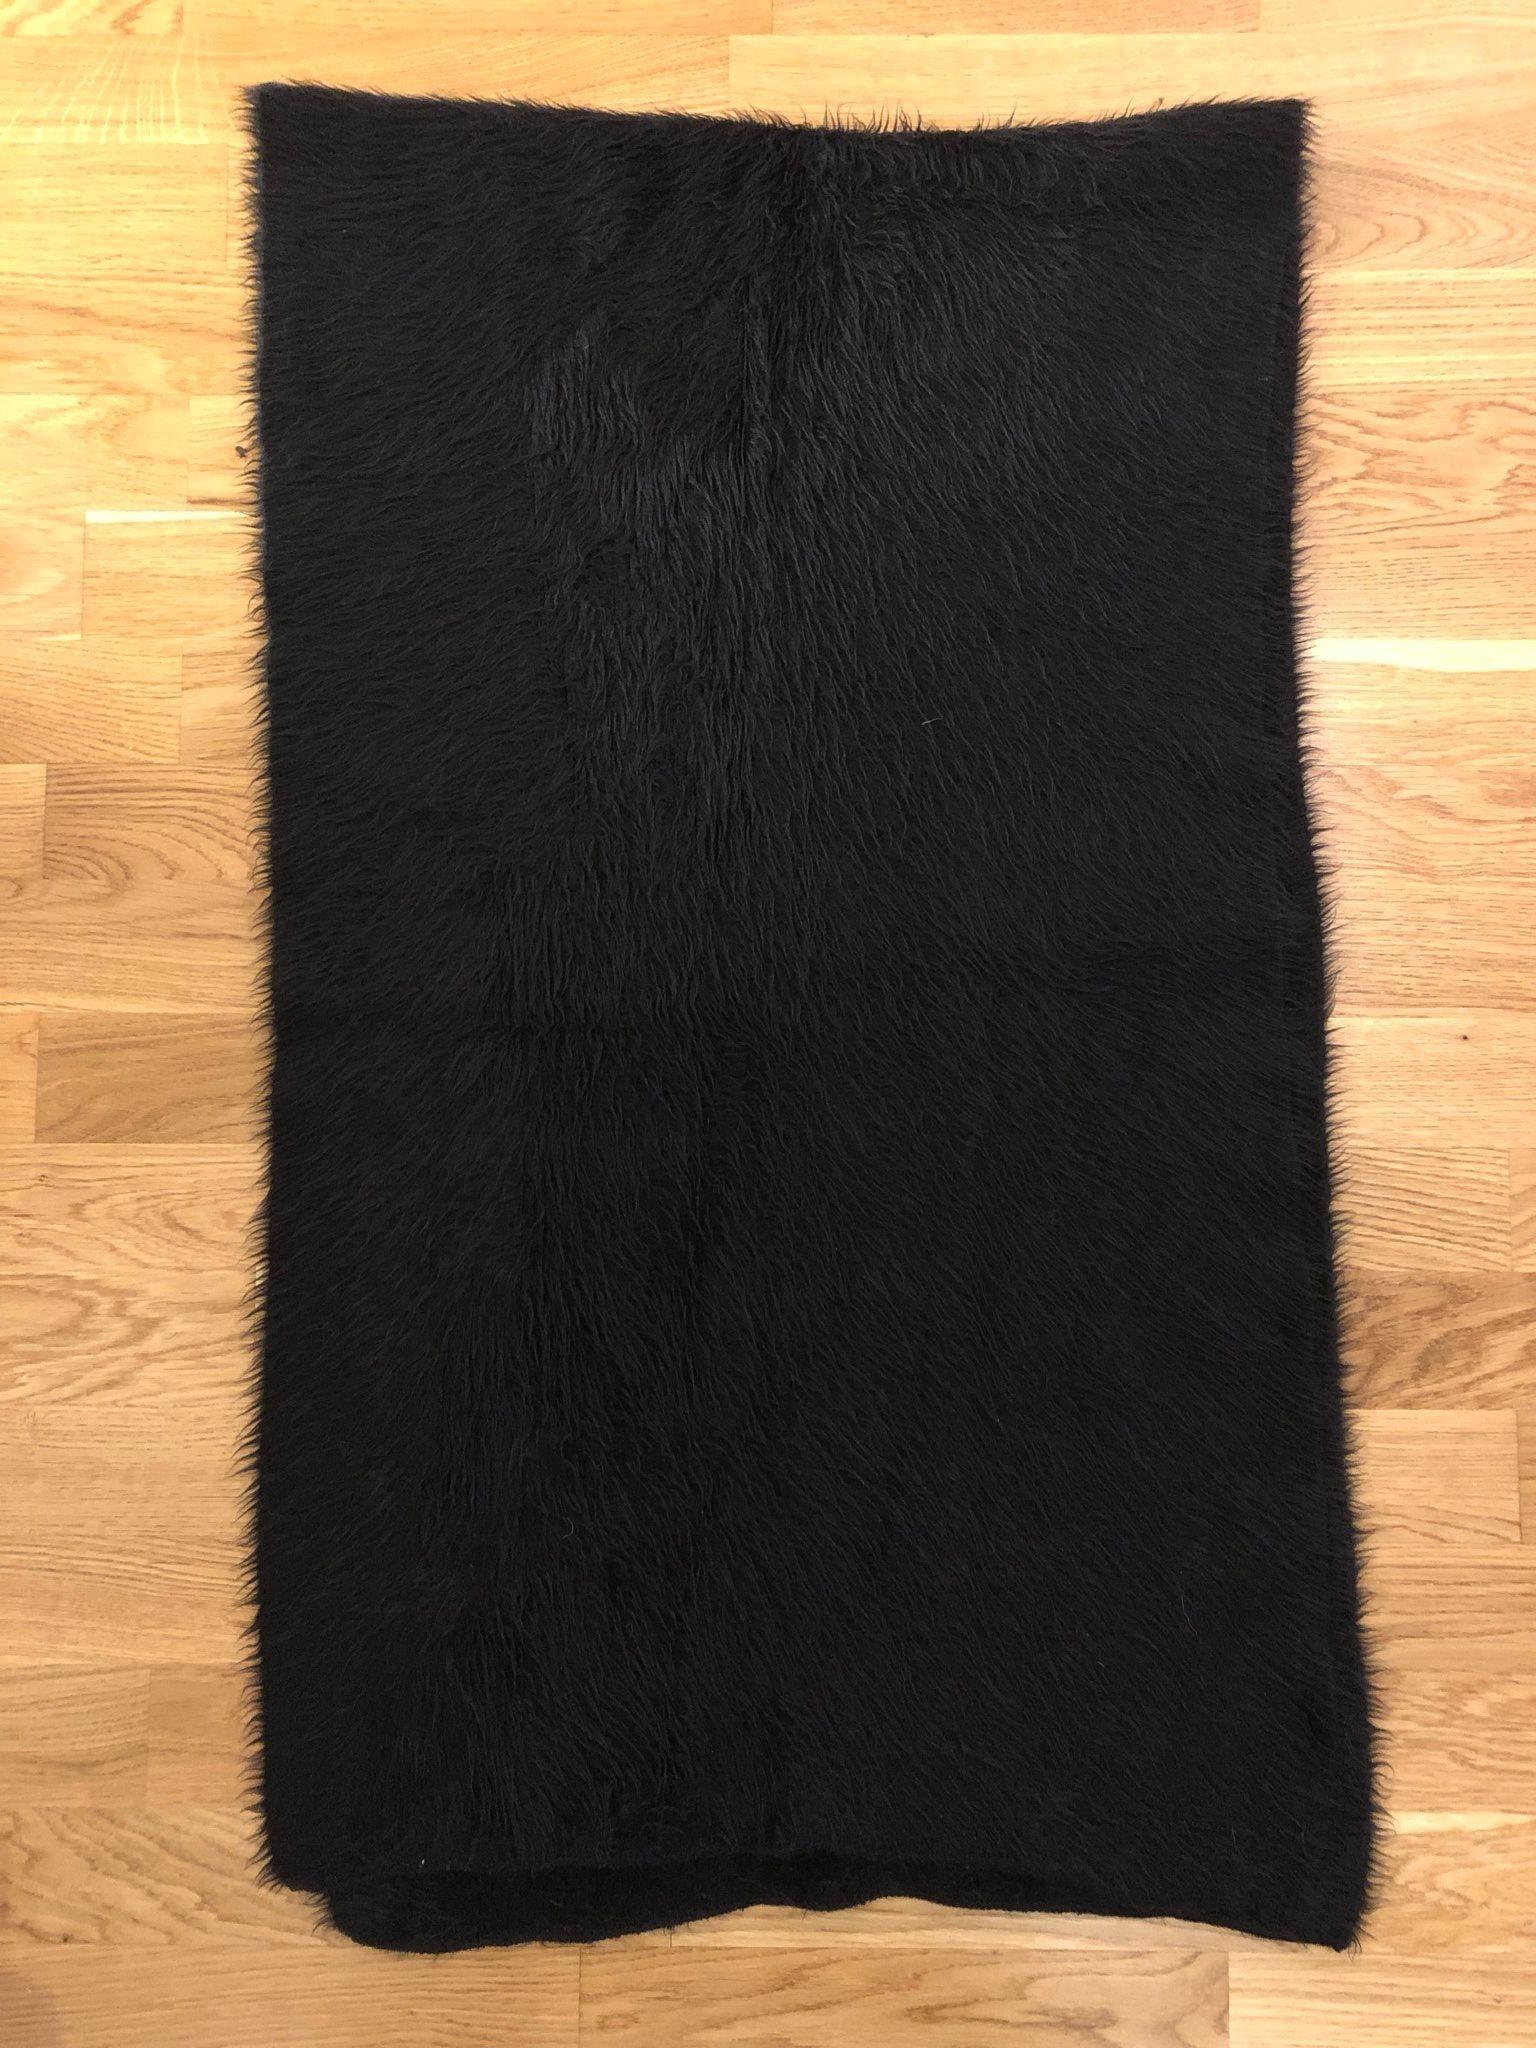 Svart mjuk och lurvig halsduk från Åhléns 9d830d4e9d7d8